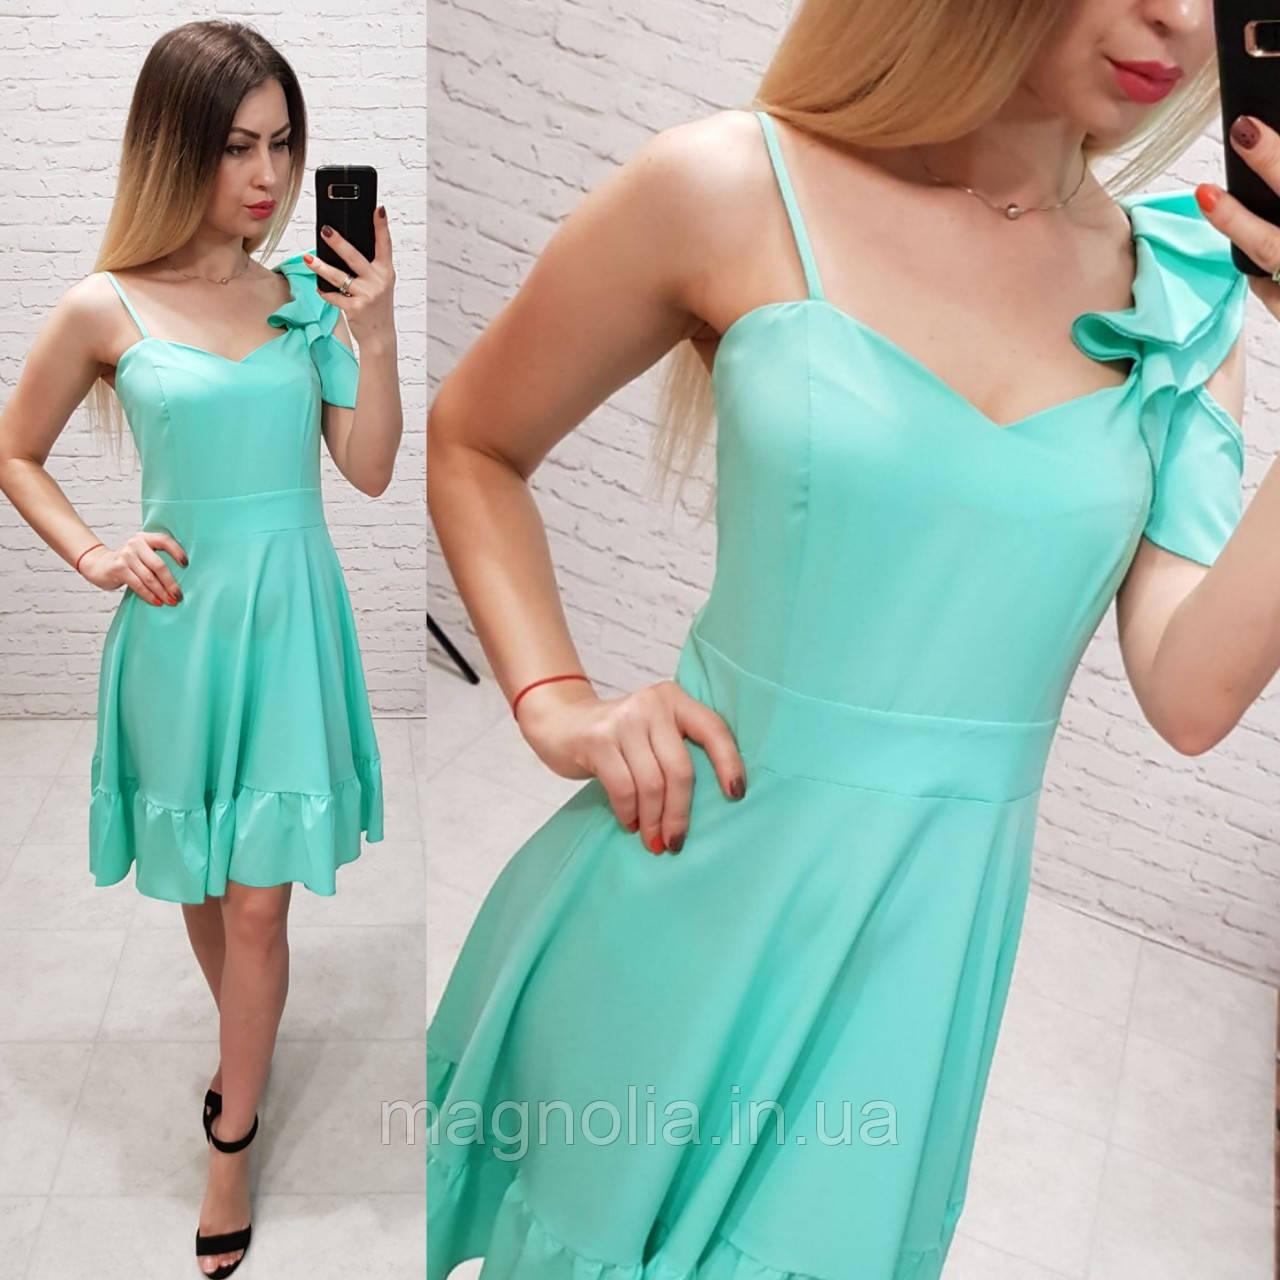 Платье асимметрия арт. 164 бордо / вишня / марсала